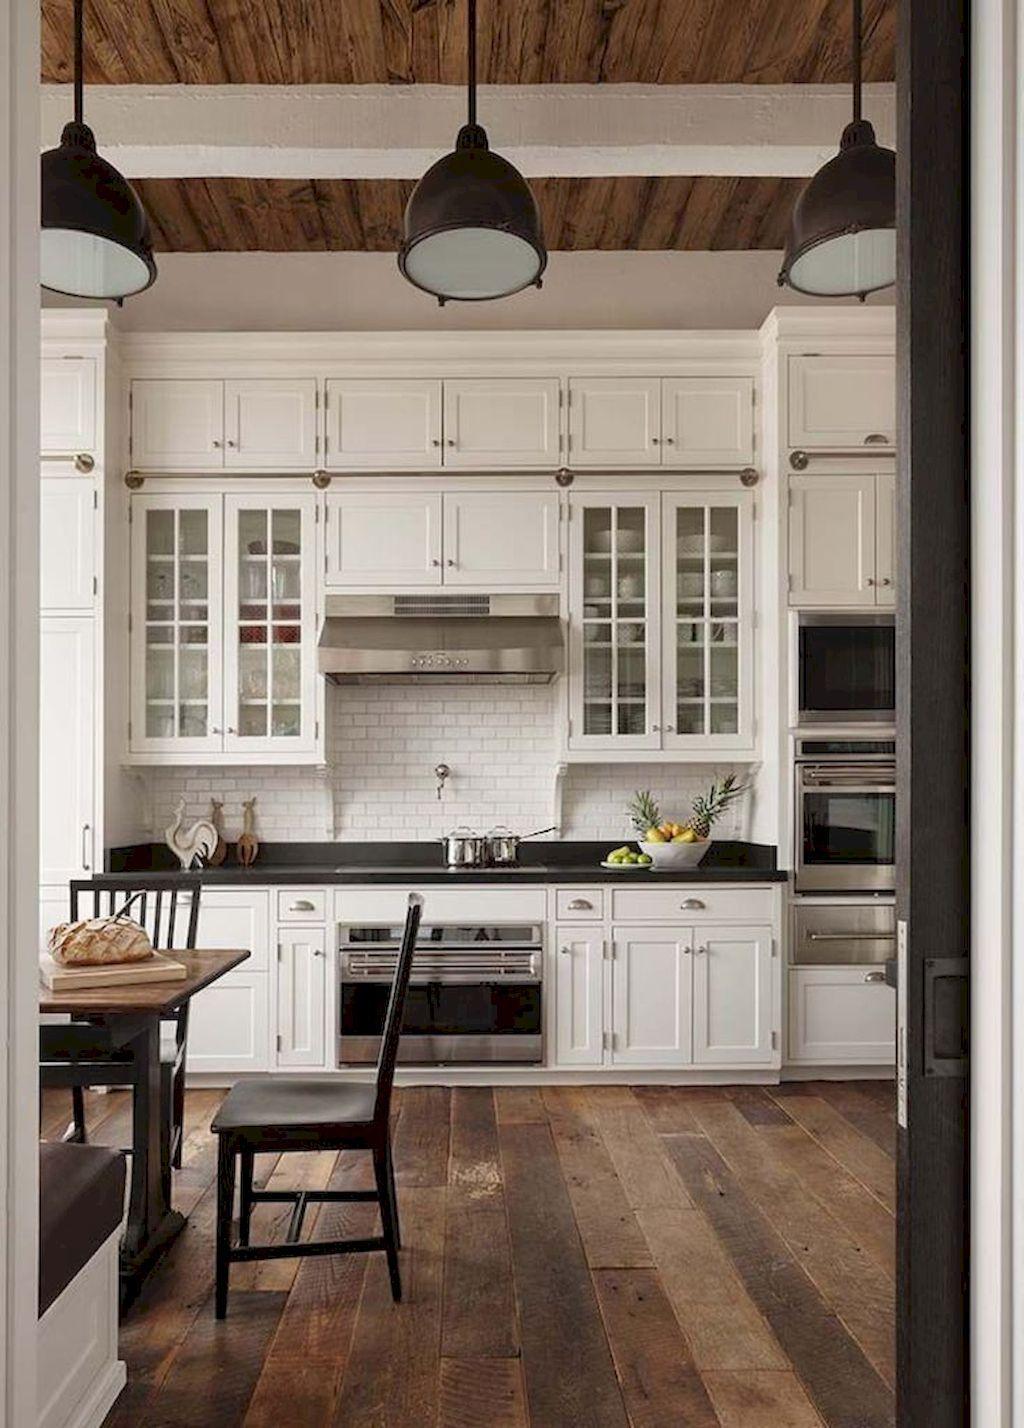 23 Modern Farmhouse Kitchen Cabinet Makeover Design Ideas Besideroom Co Farmhouse Kitchen Design Rustic Farmhouse Kitchen Kitchen Cabinets Decor